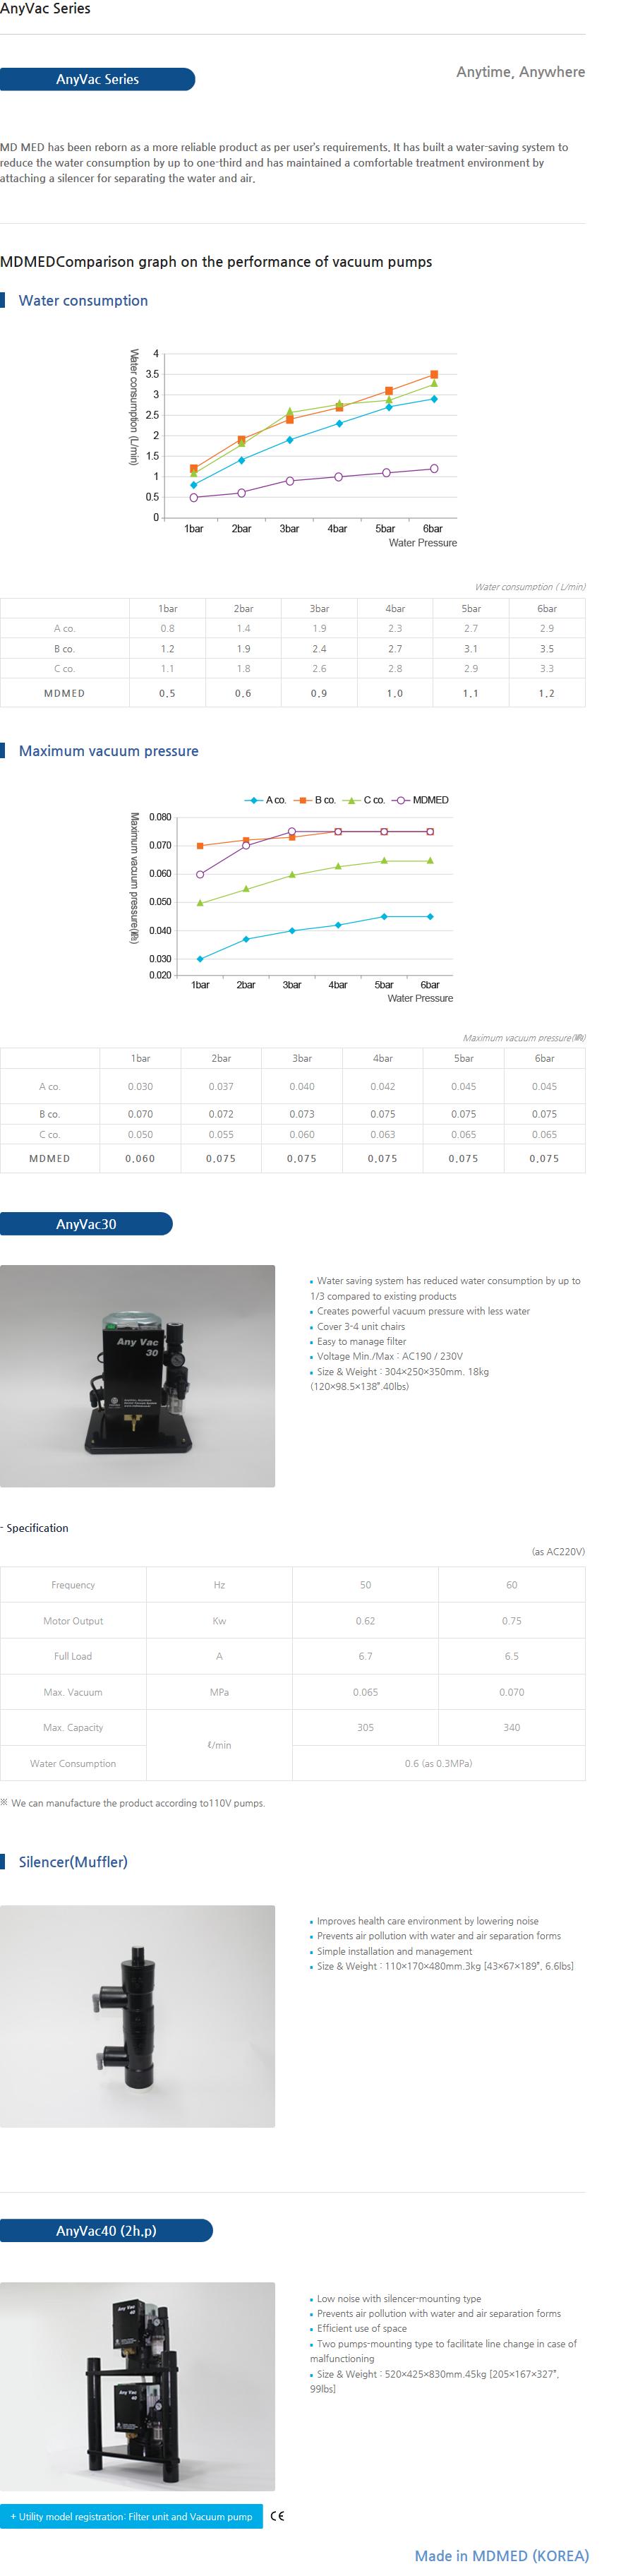 MDMED Vacuum pump AnyVac Series